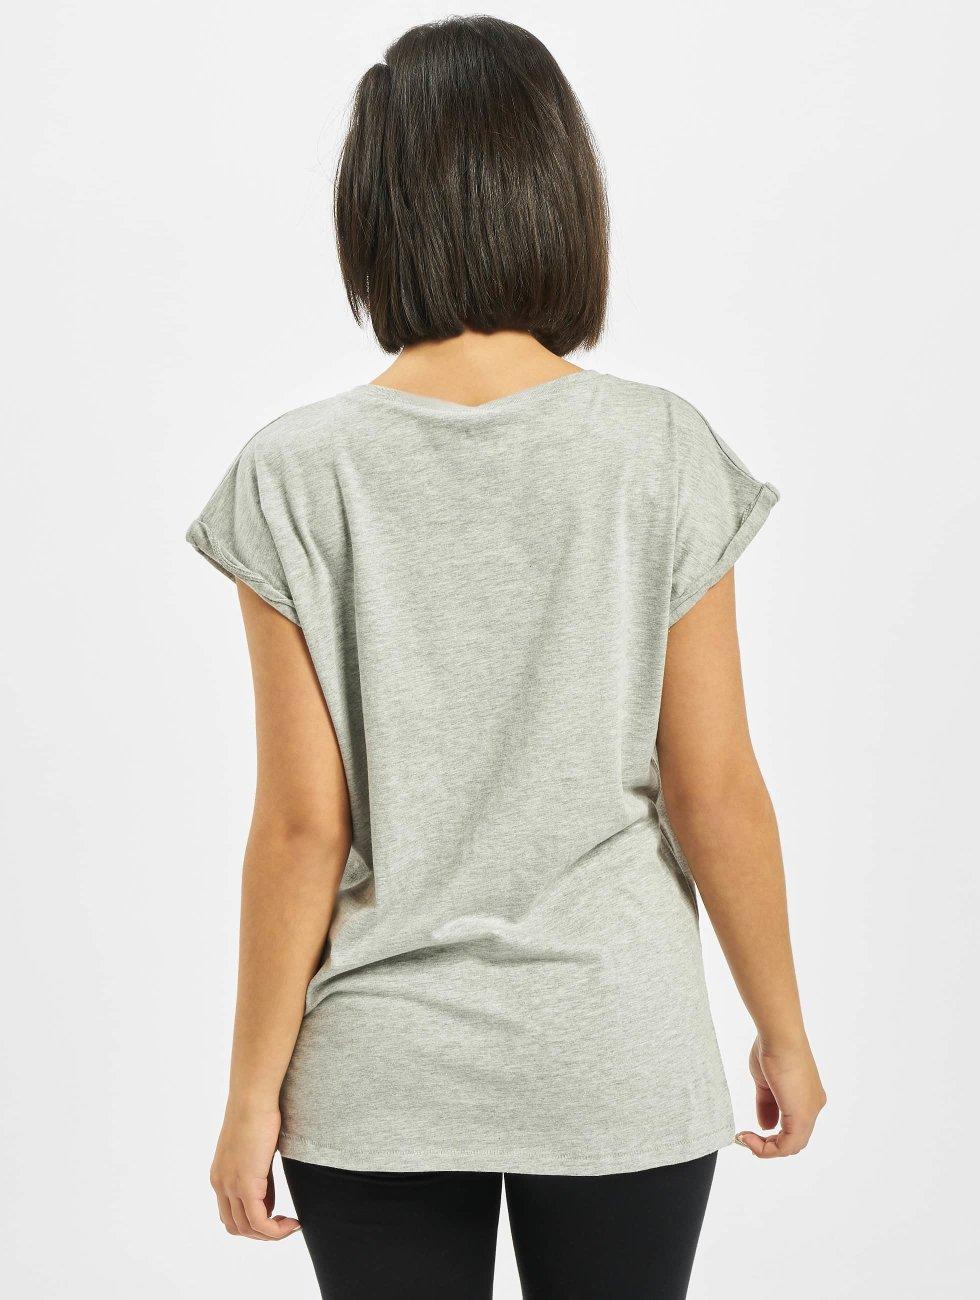 Mister Tee T-Shirt Ladies Five Seconds Of Summer Longprint gray